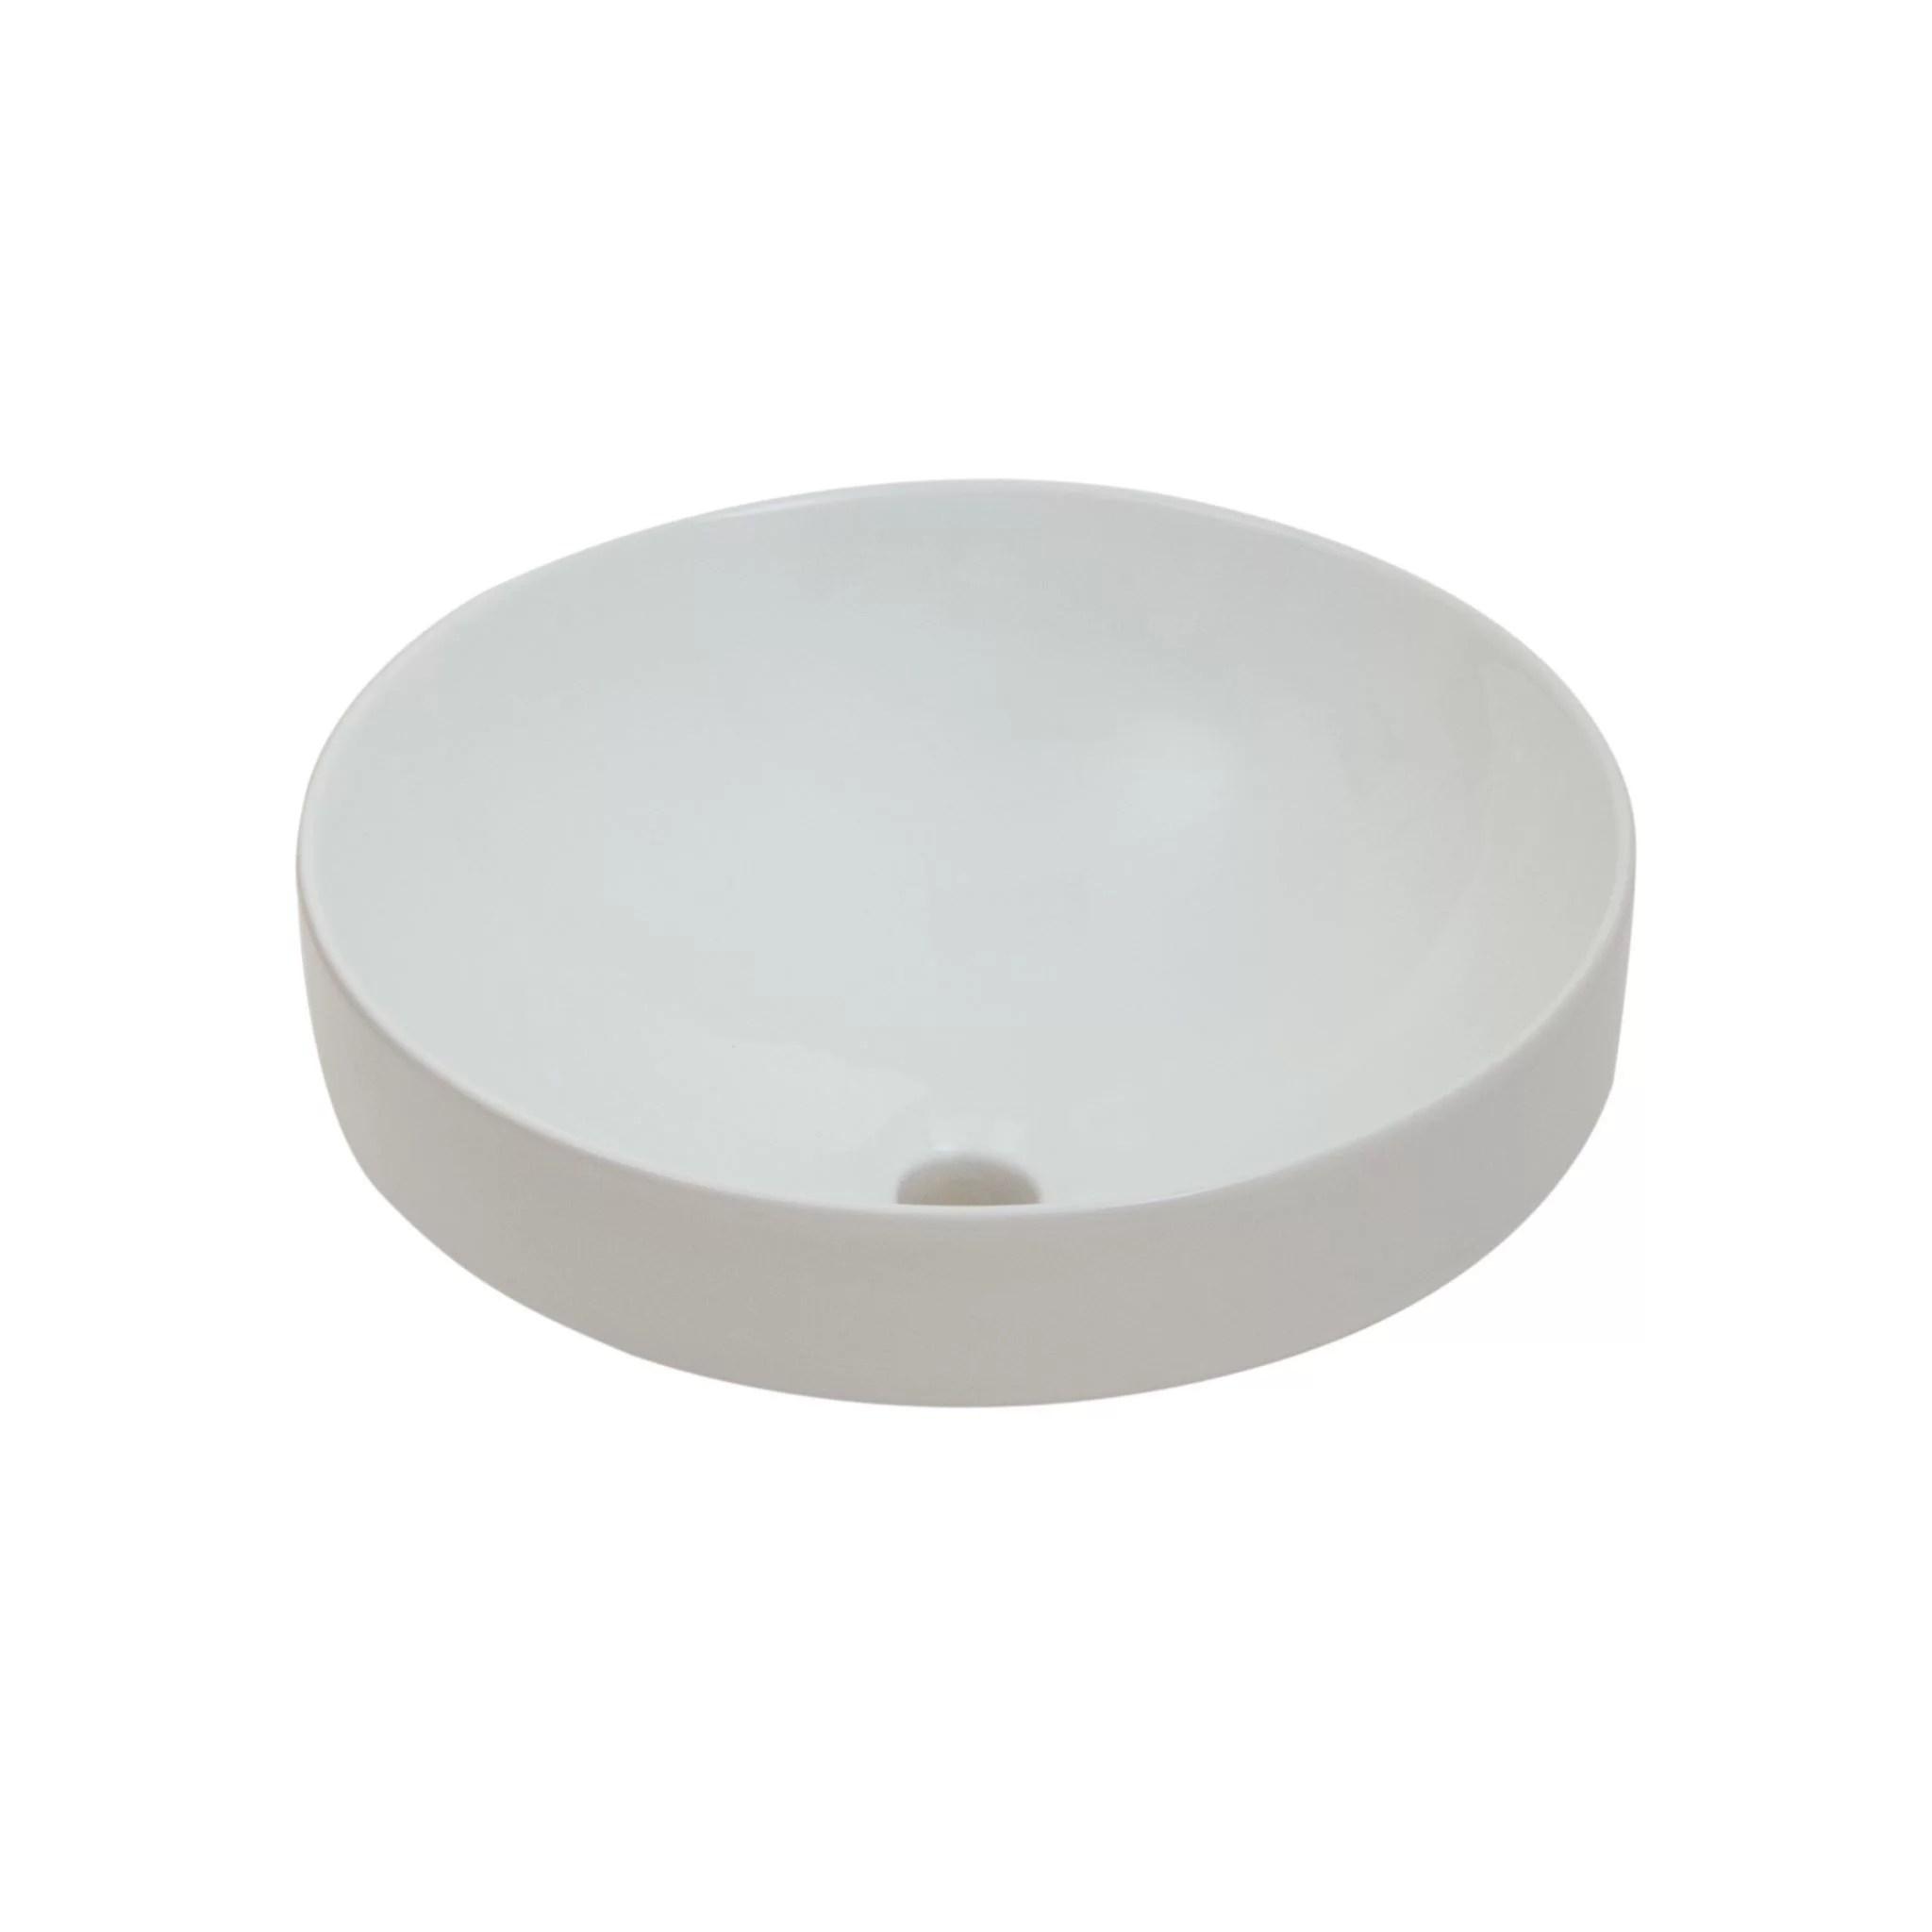 foremost white fireclay round semi recessed vessel sink walmart com